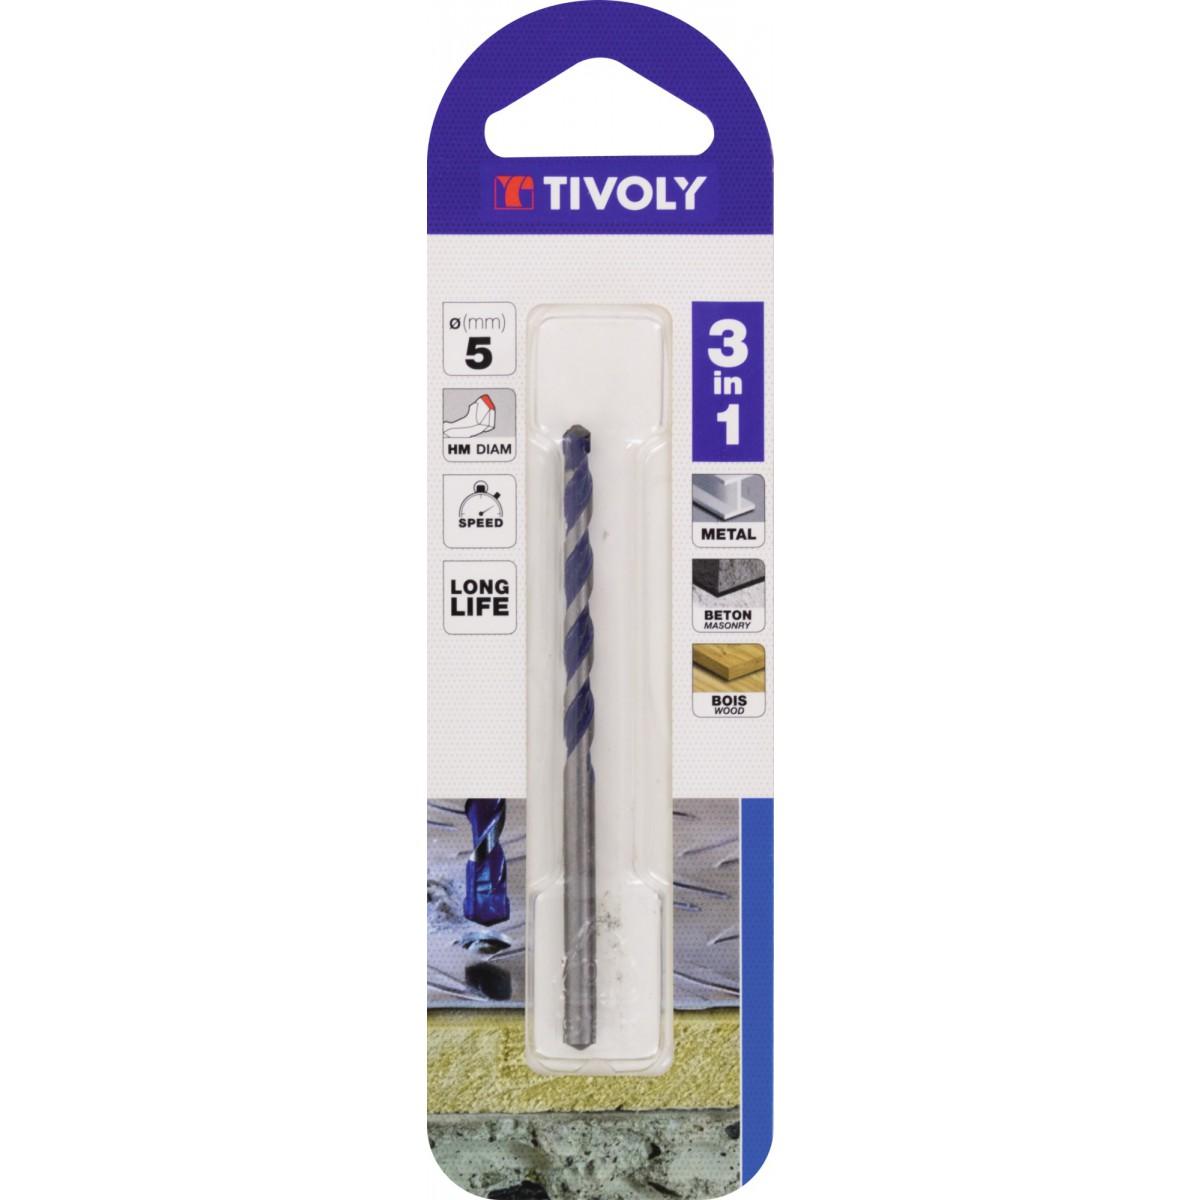 Foret multi-materiaux 3 en 1 Tivoly - Diamètre 5 mm